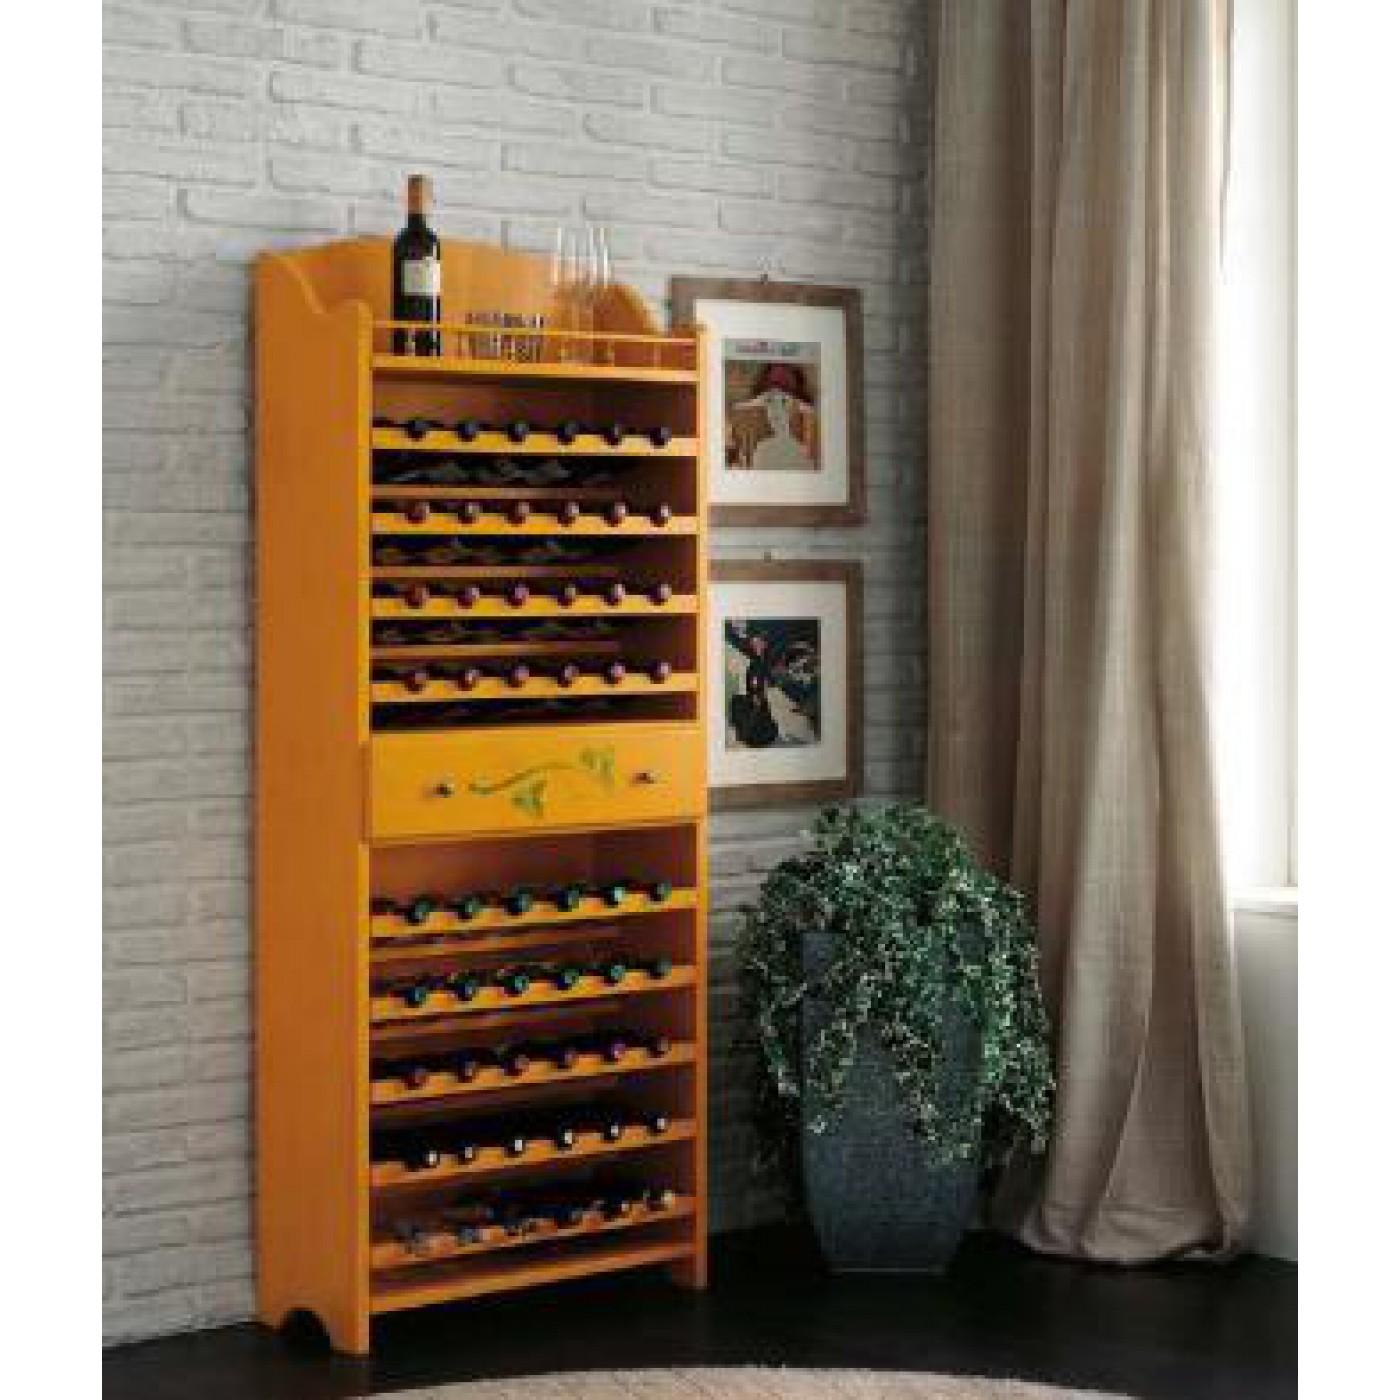 Фото винный шкаф на лоджии.